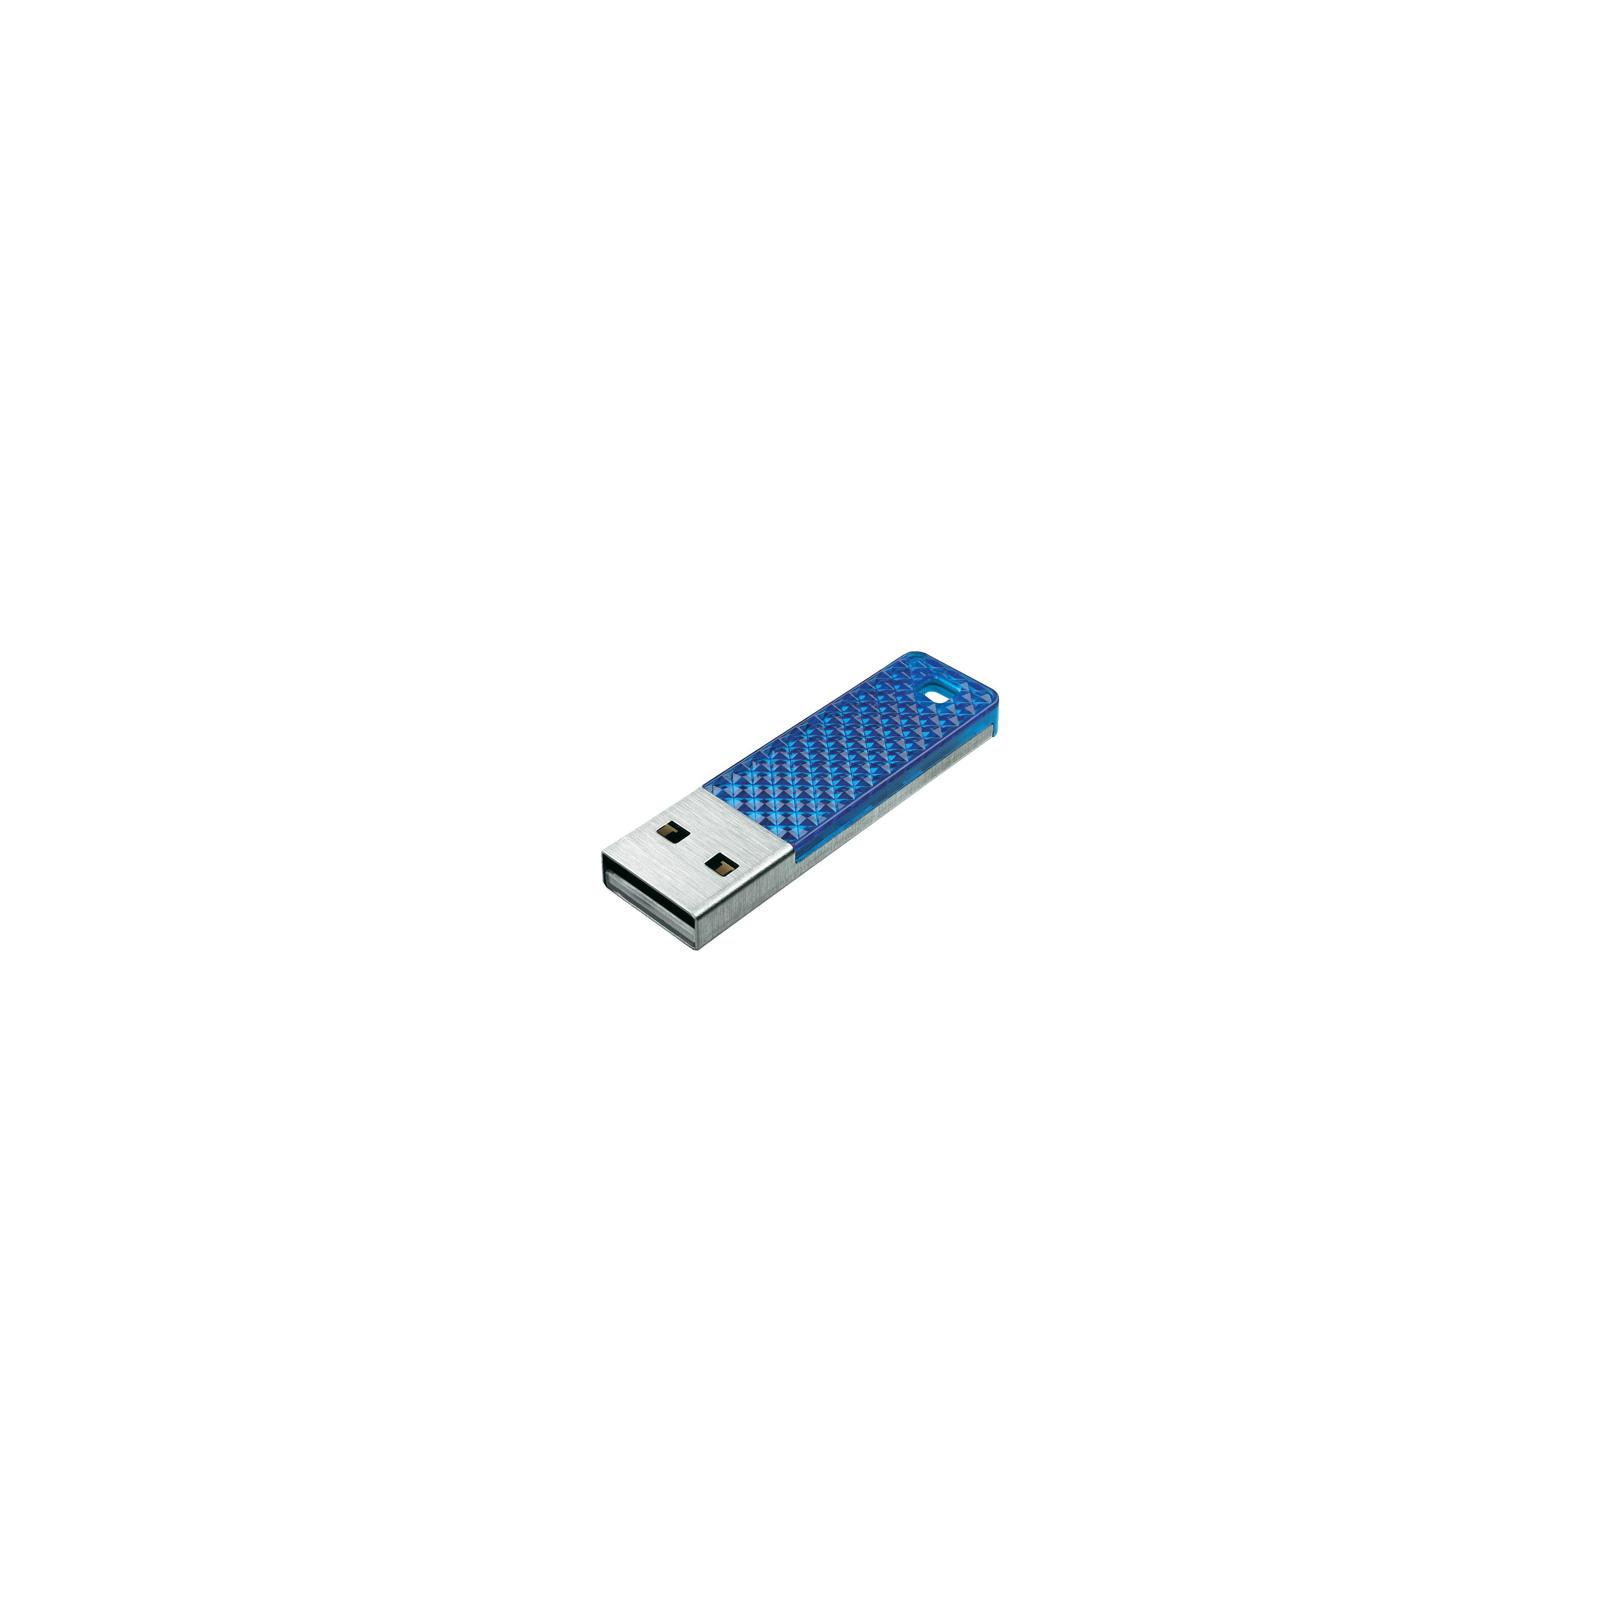 USB флеш накопитель SANDISK 32Gb Cruzer Facet blue (SDCZ55-032G-B35B)